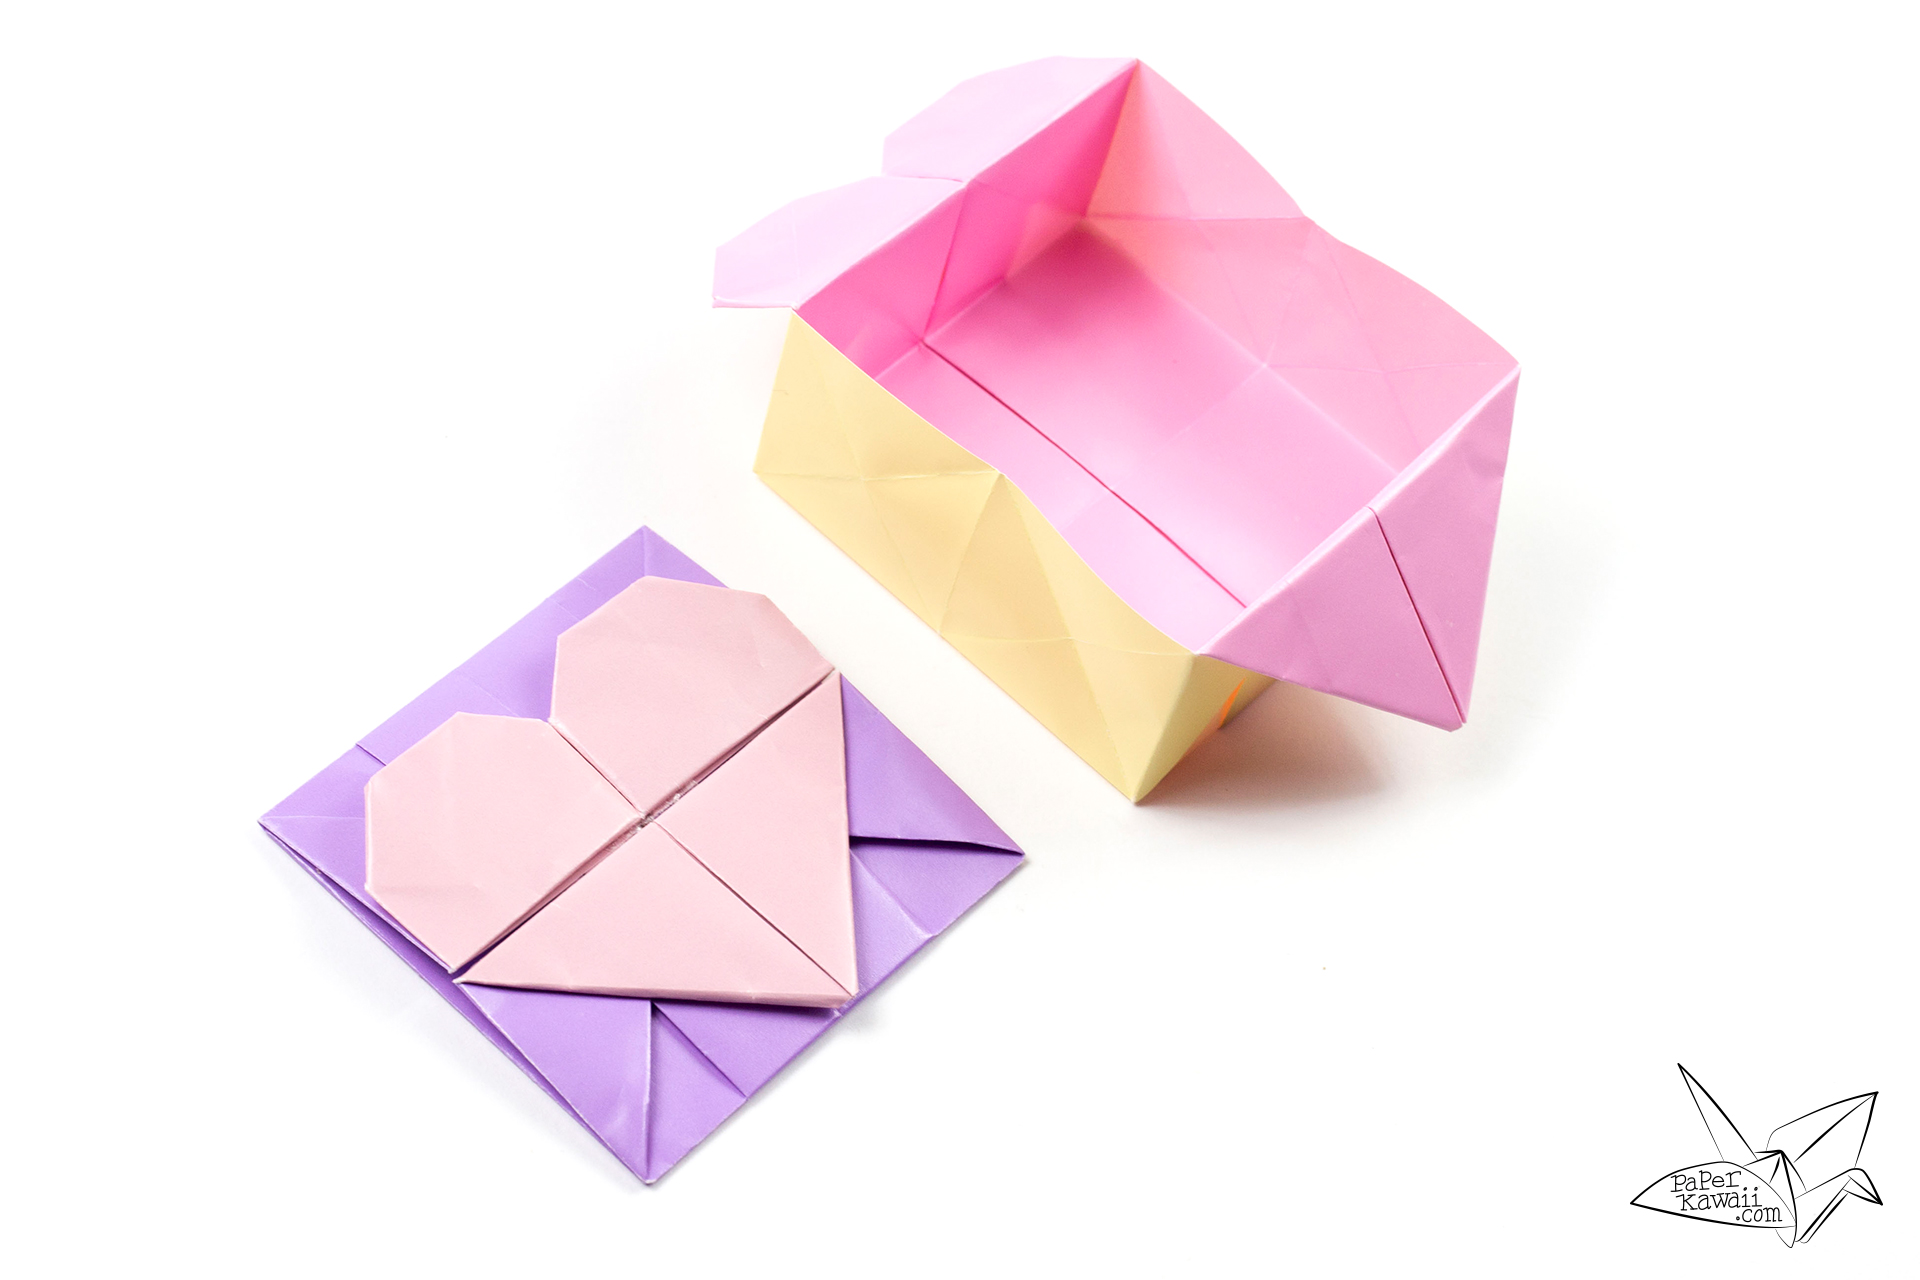 Origami Heart Box (Tutorial) - YouTube | 1280x1920